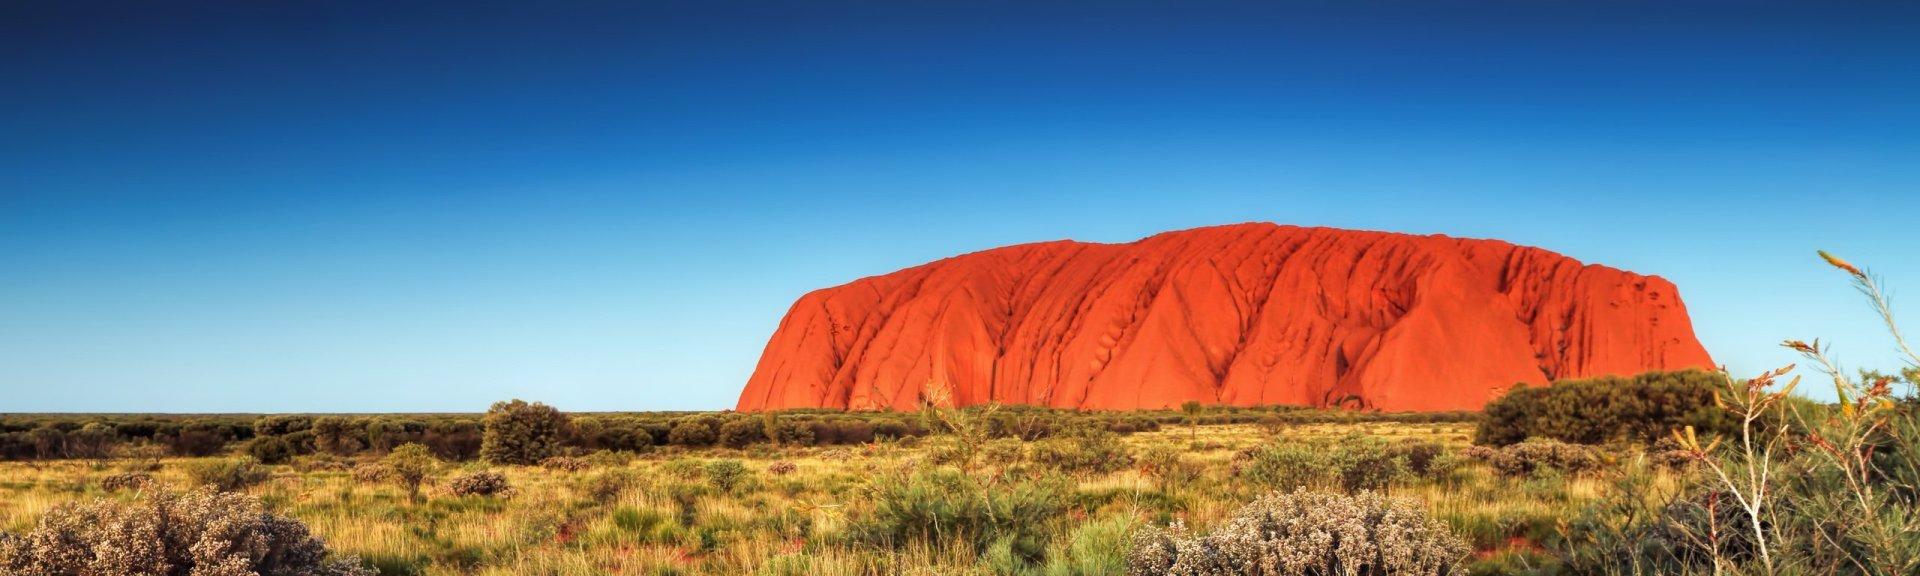 Highlights | Uluru-Kata Tjuta National Park